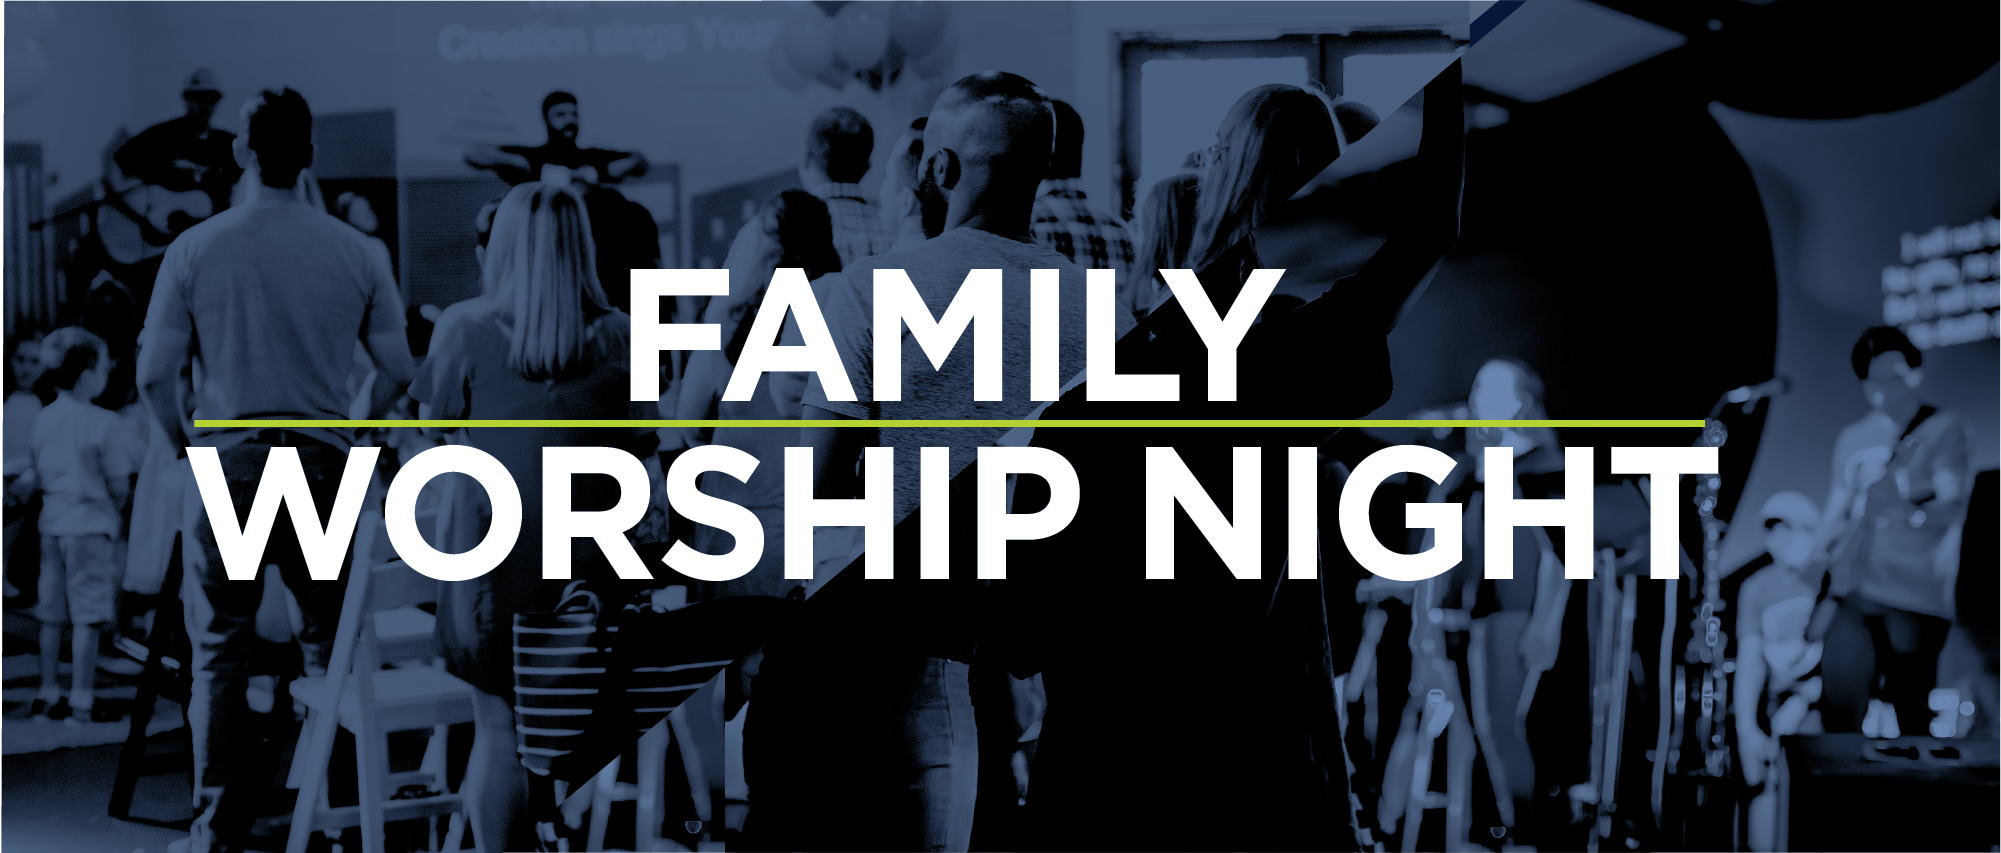 Family Worship Night Web.jpg